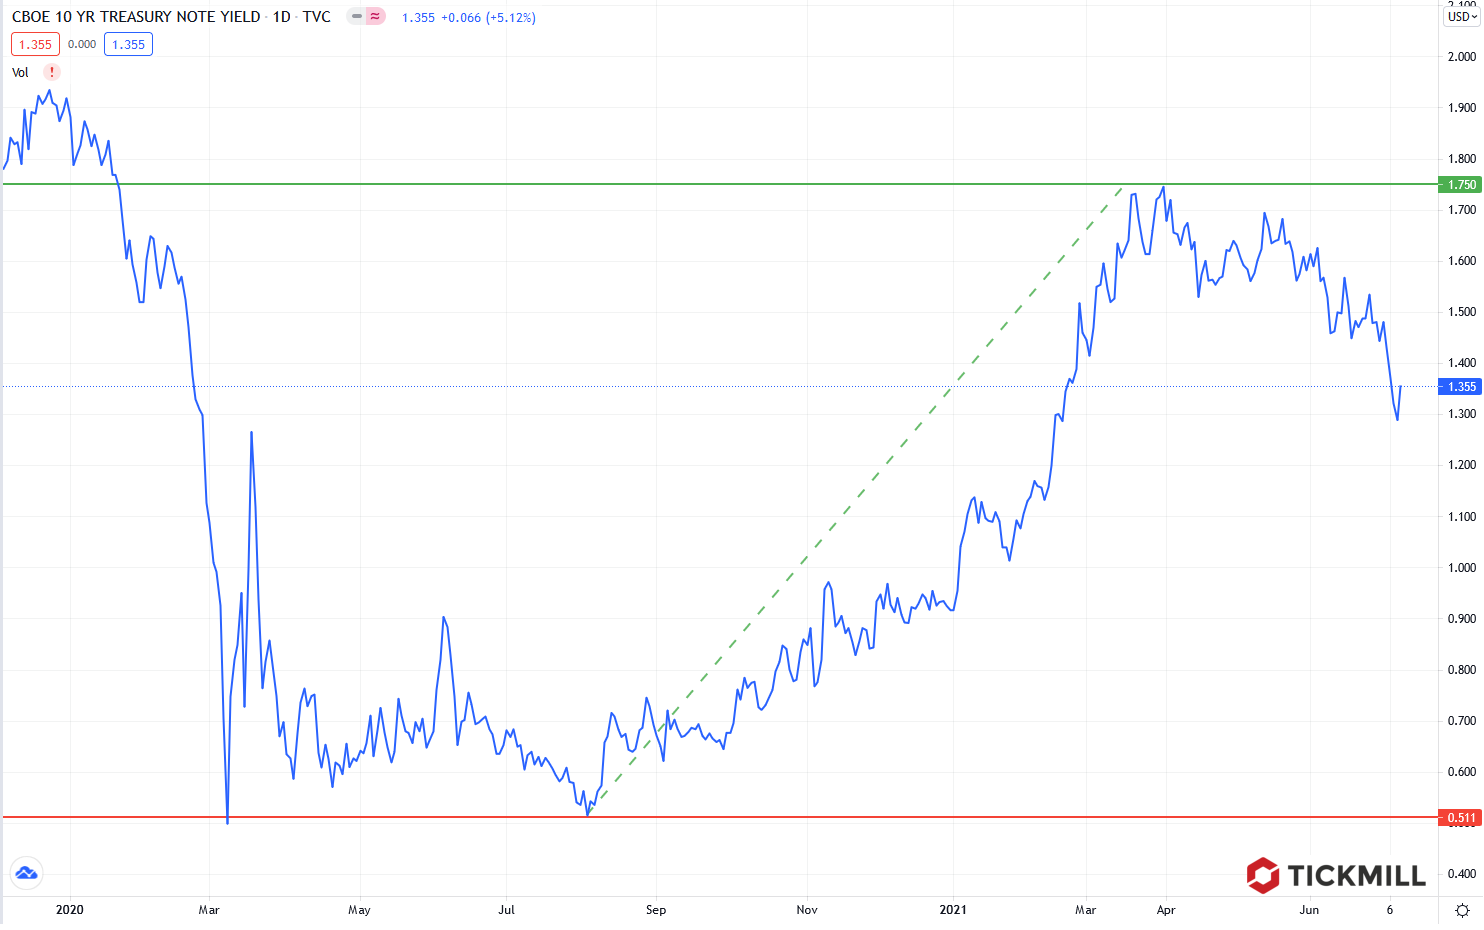 Tickmill-Analyse: 10-jährige US-Zinsen